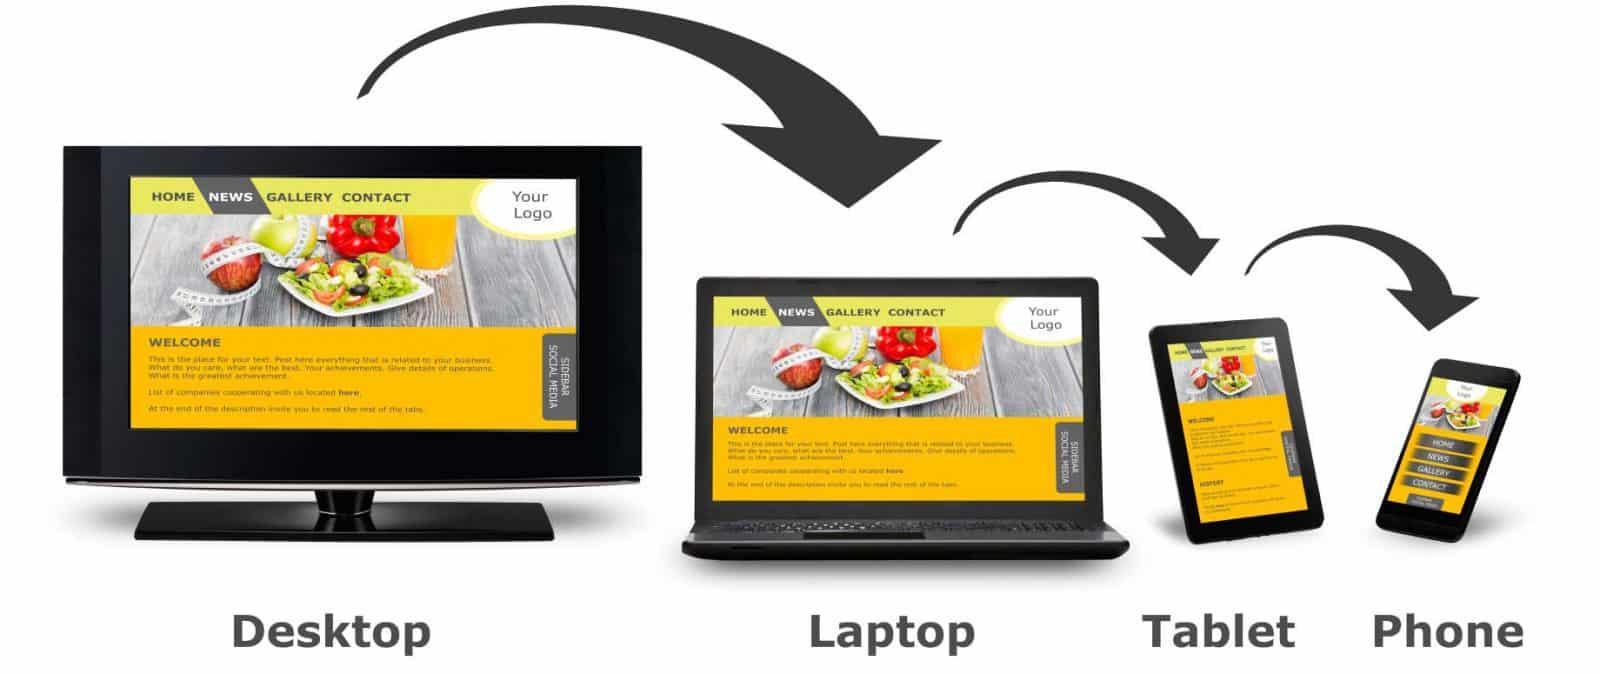 Responsive design - device independant